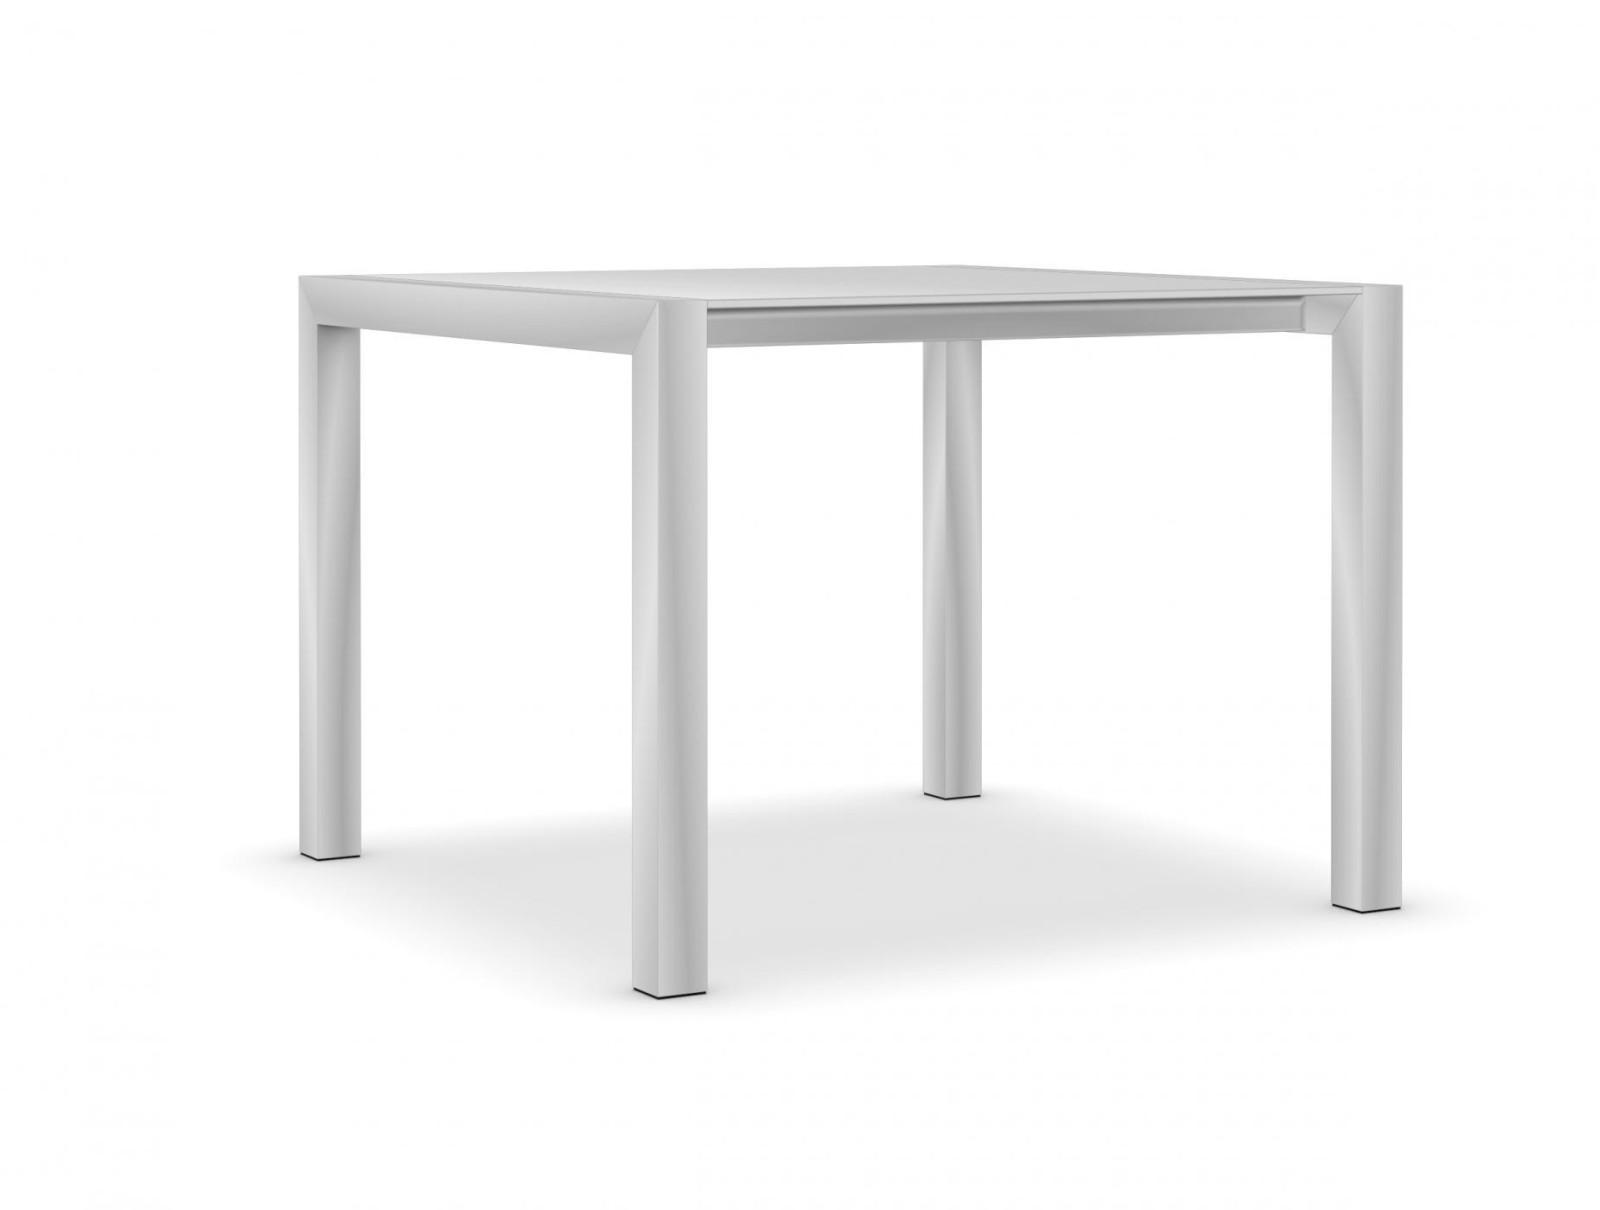 Sushi Glass Fixed - Depth 100 100, Anodised Aluminium, Gloss glass: Extra White